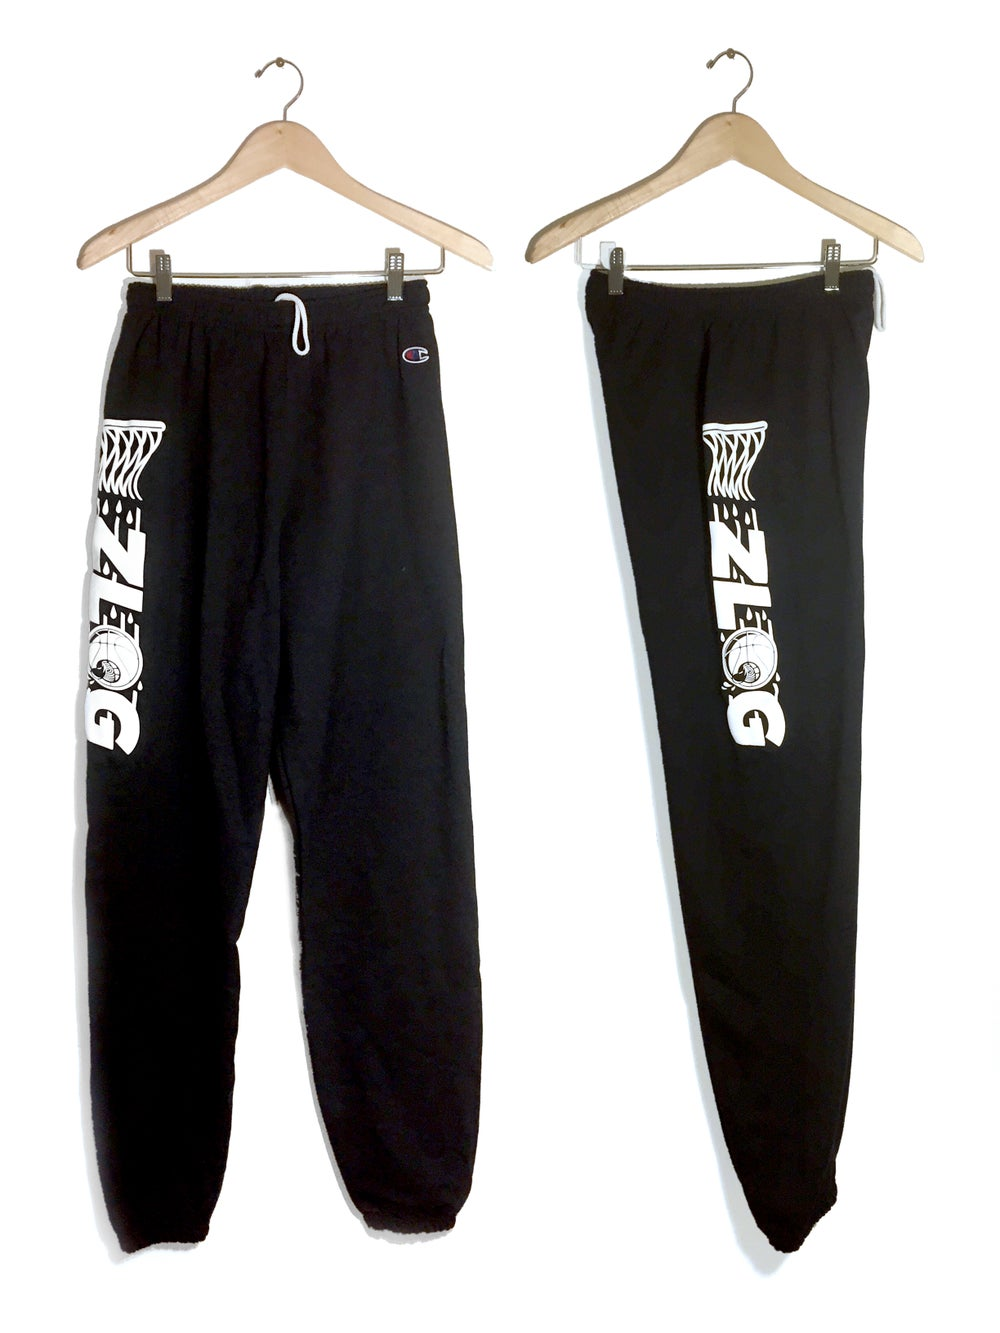 Image of ZLOG HOOPS - Warm Up Sweatpants